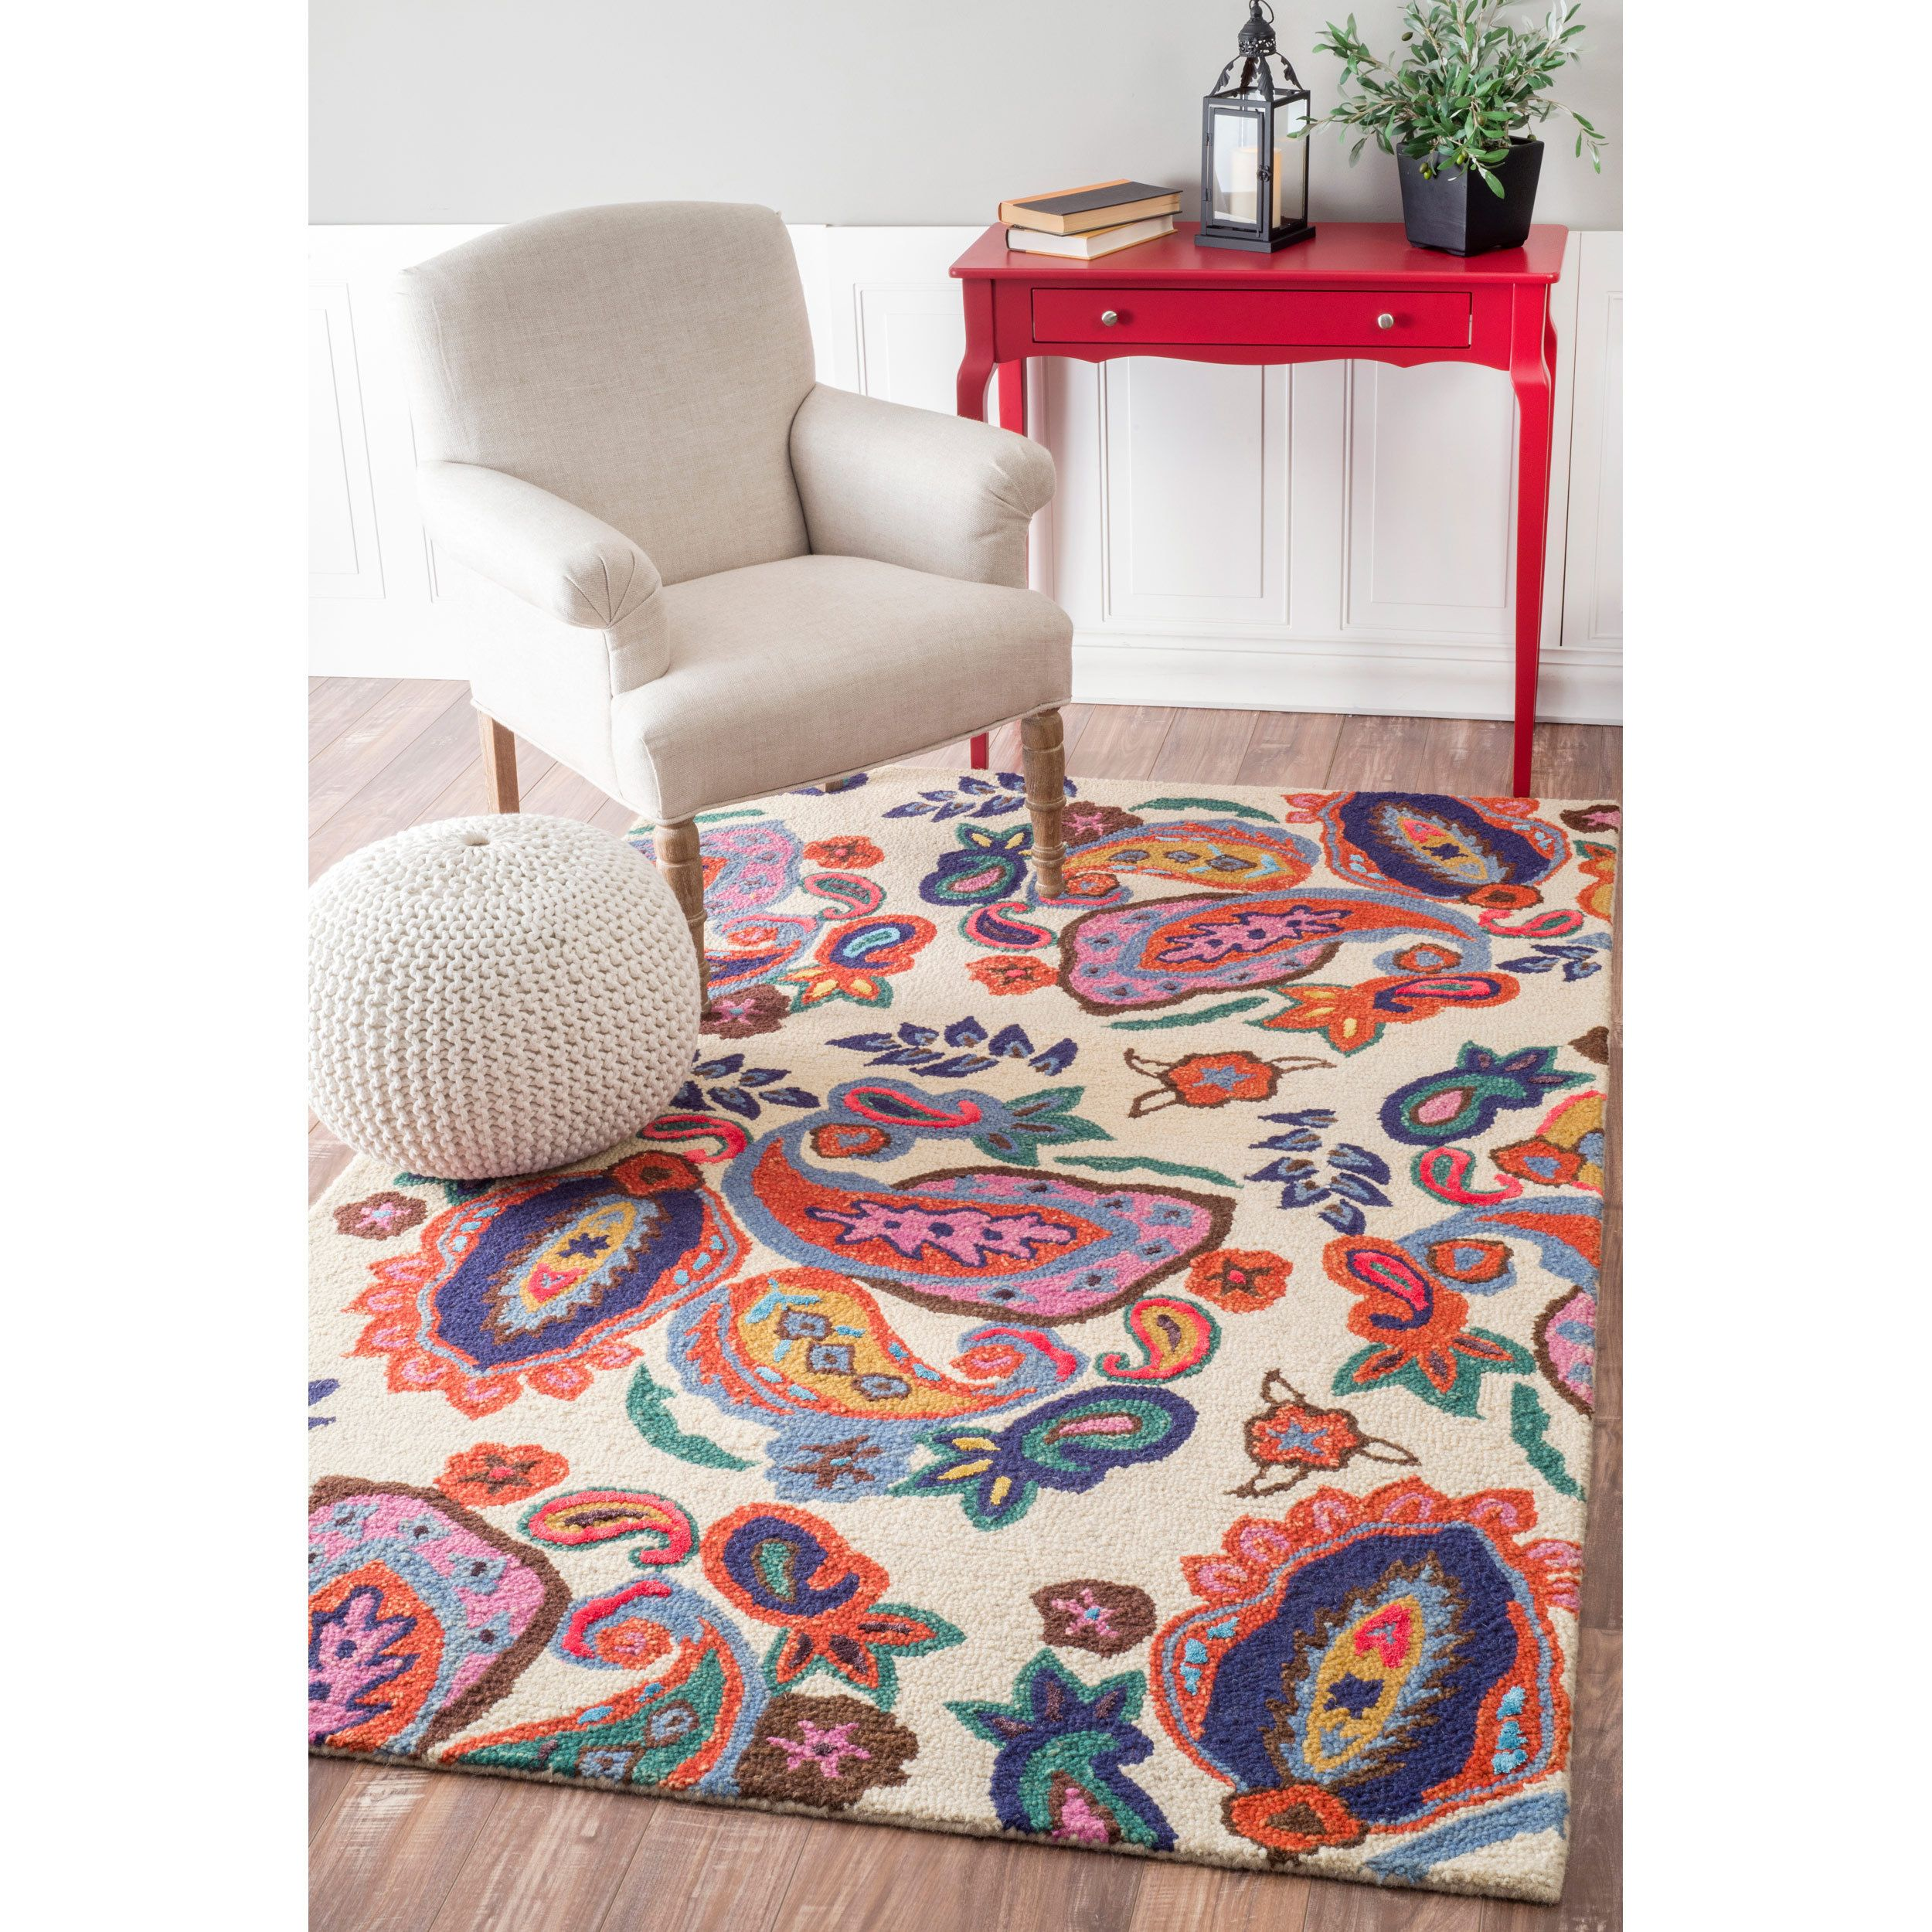 Nuloom Contemporary Handmade Wool Viscose Vibrant Paisley Beige Rug 7 6 X 9 6